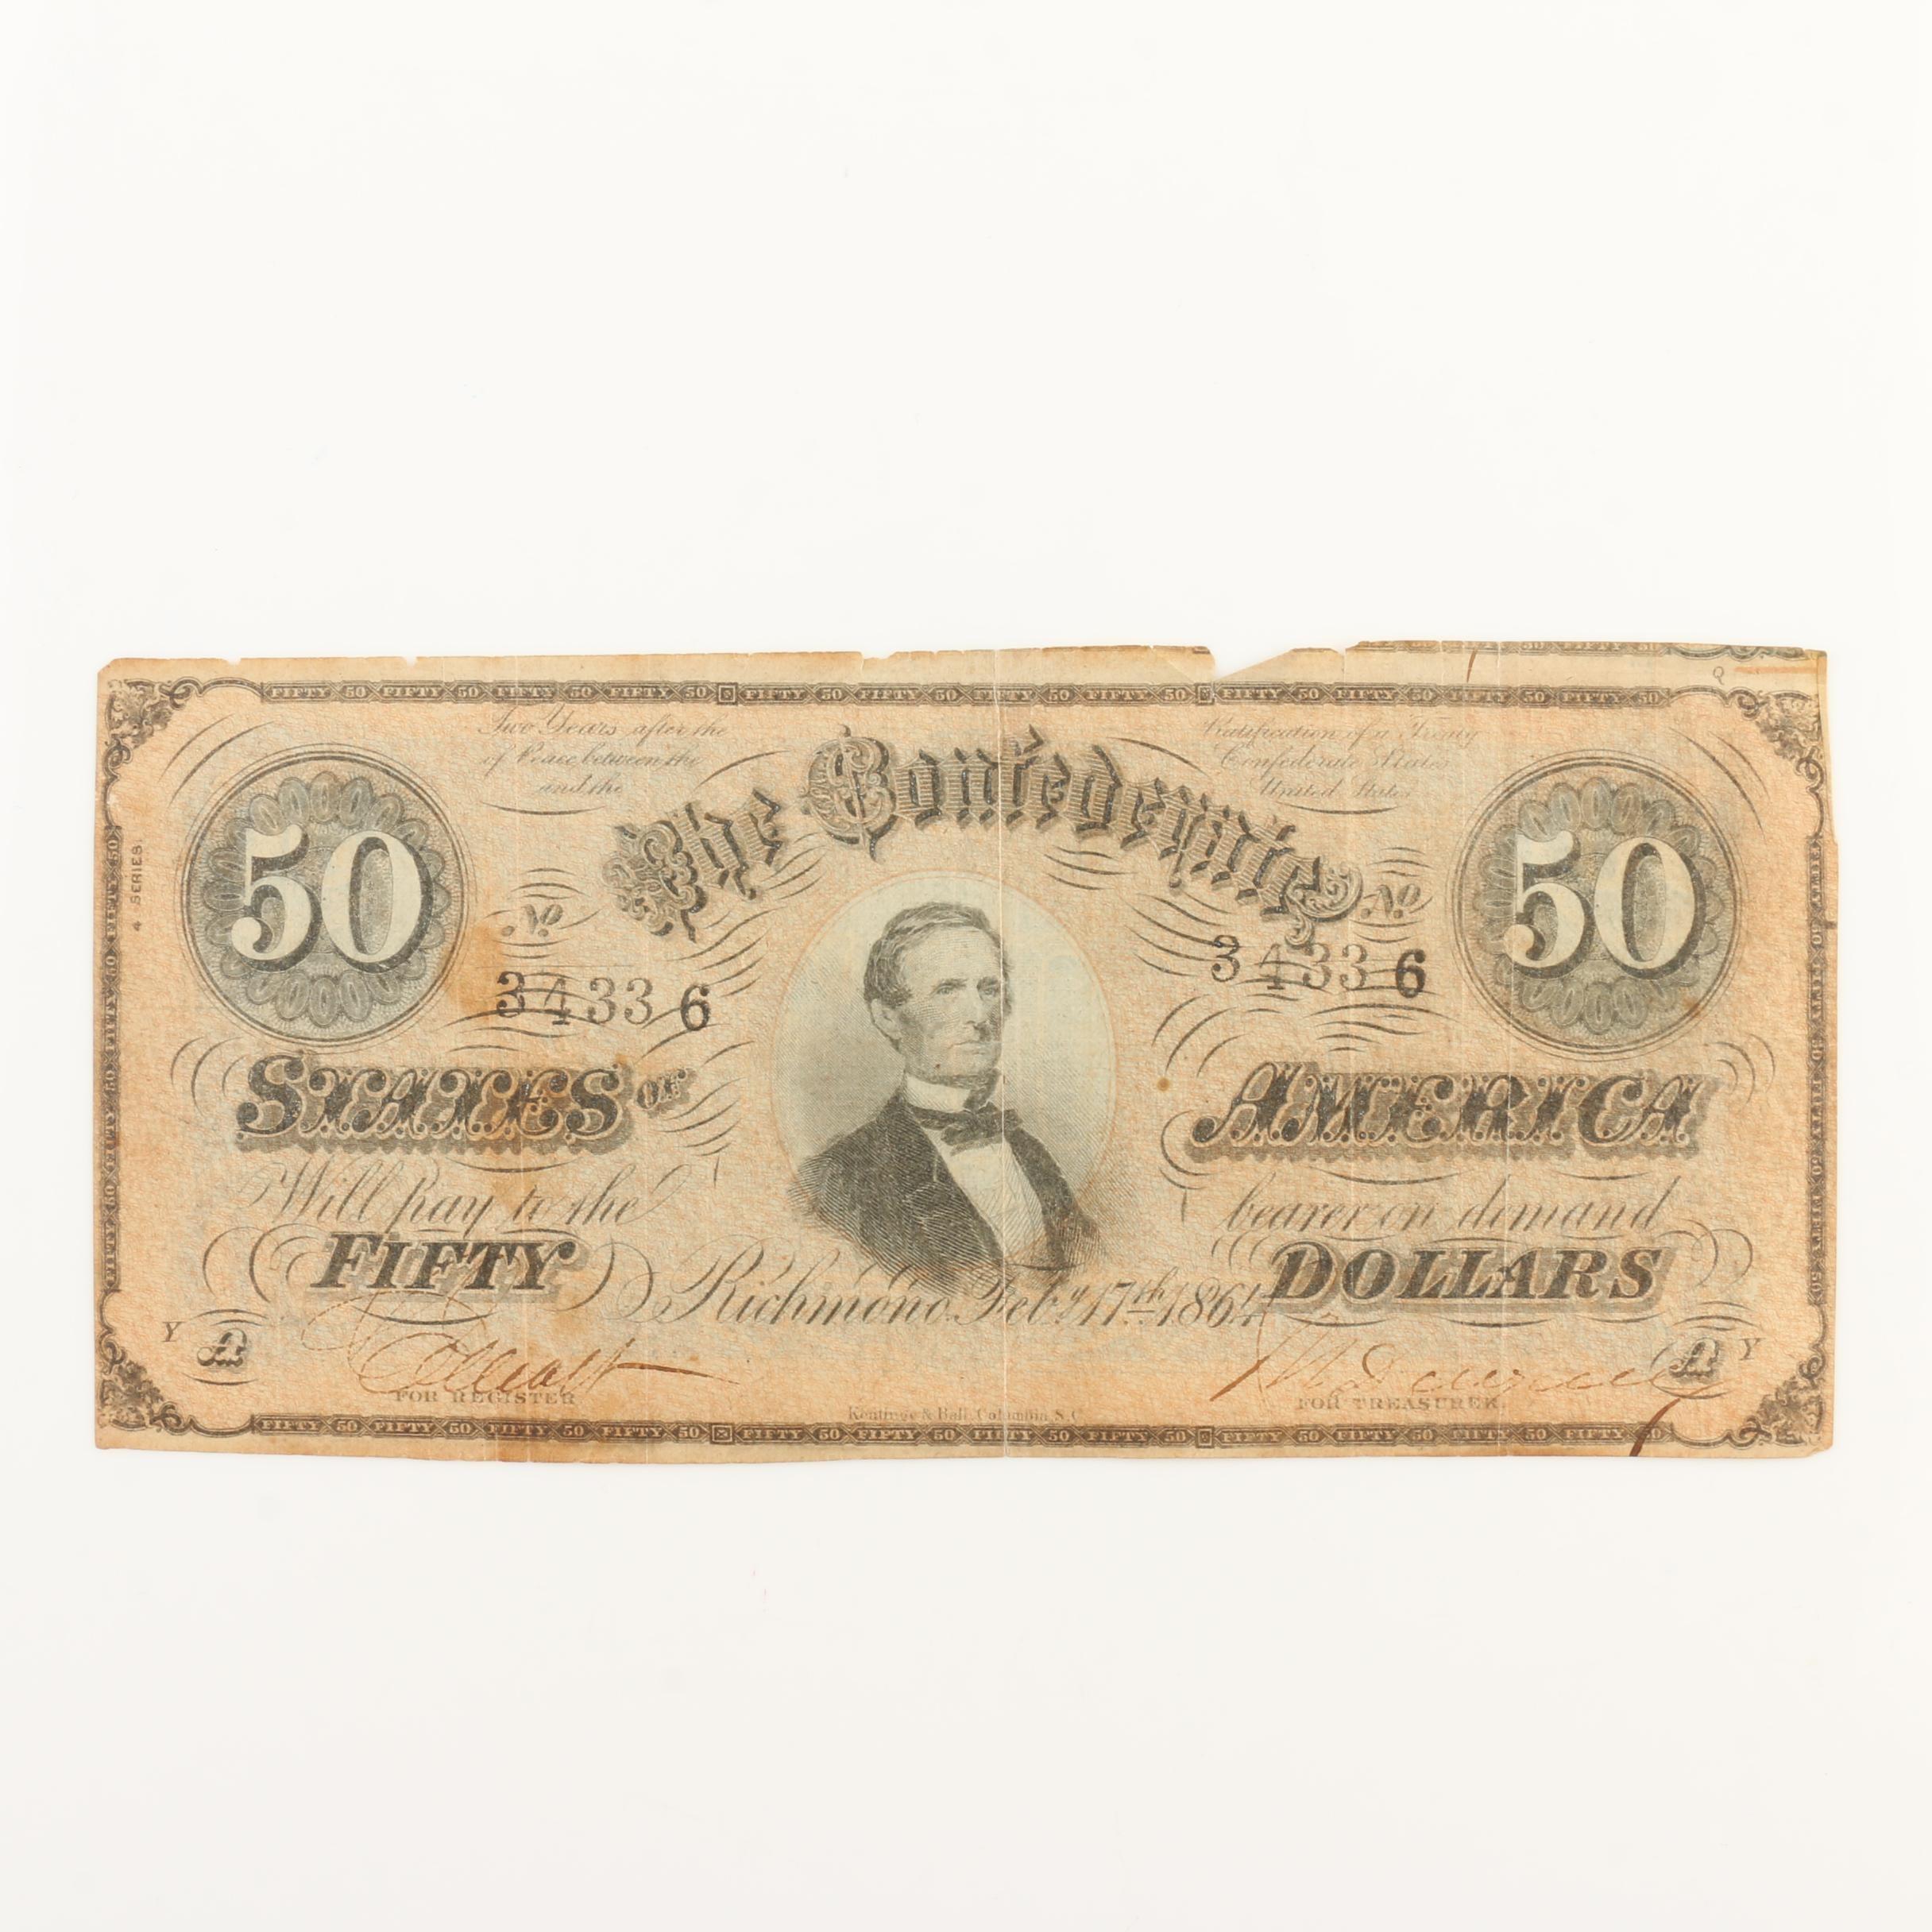 Obsolete 1864 $50 Confederate States of America Banknote